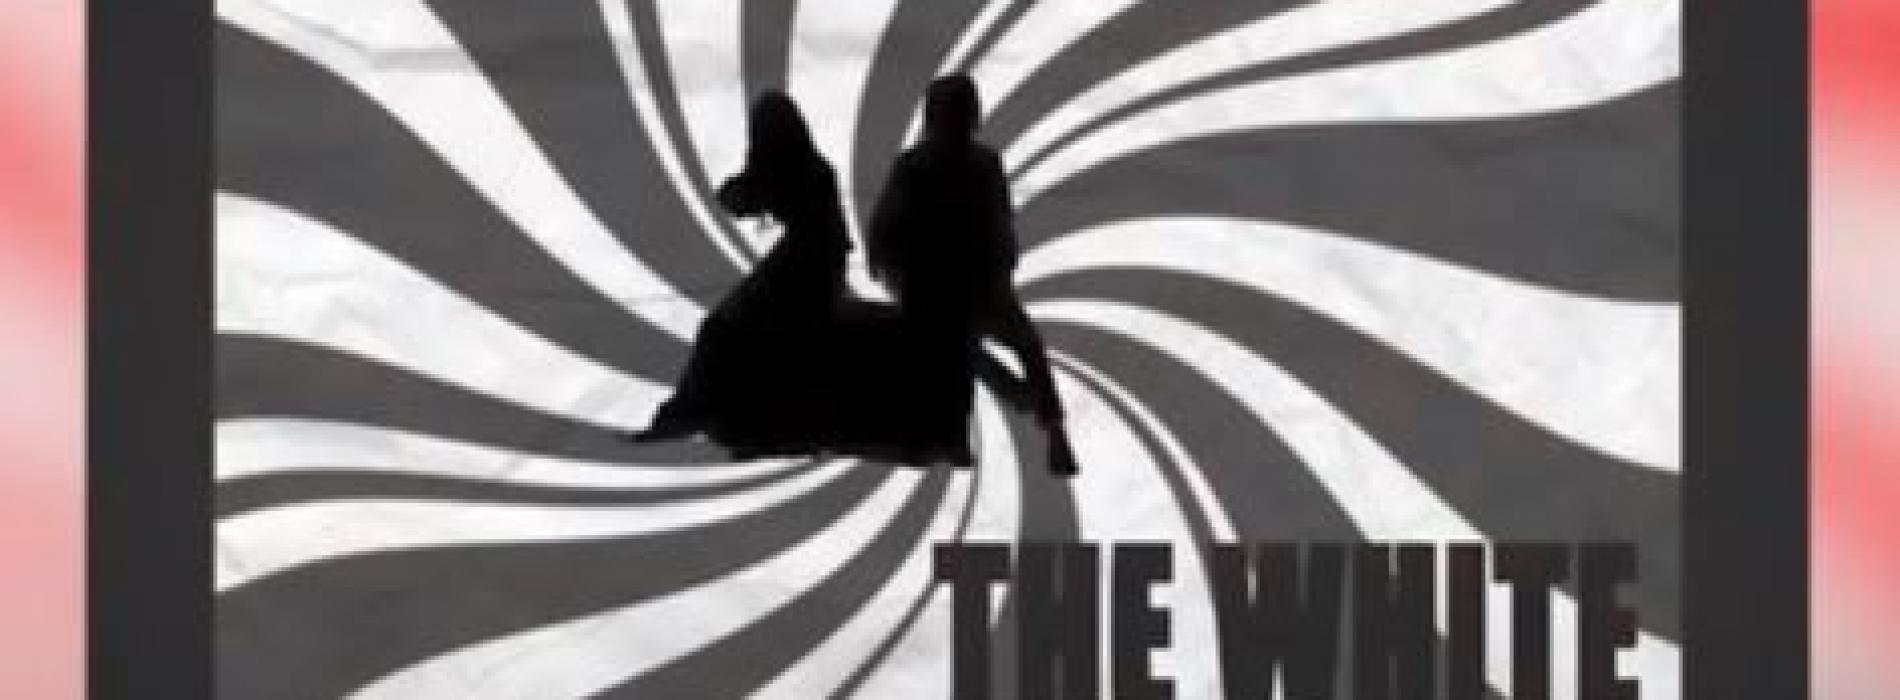 New Music : The White Stripes – Seven Nation Army (NETA Bootleg)